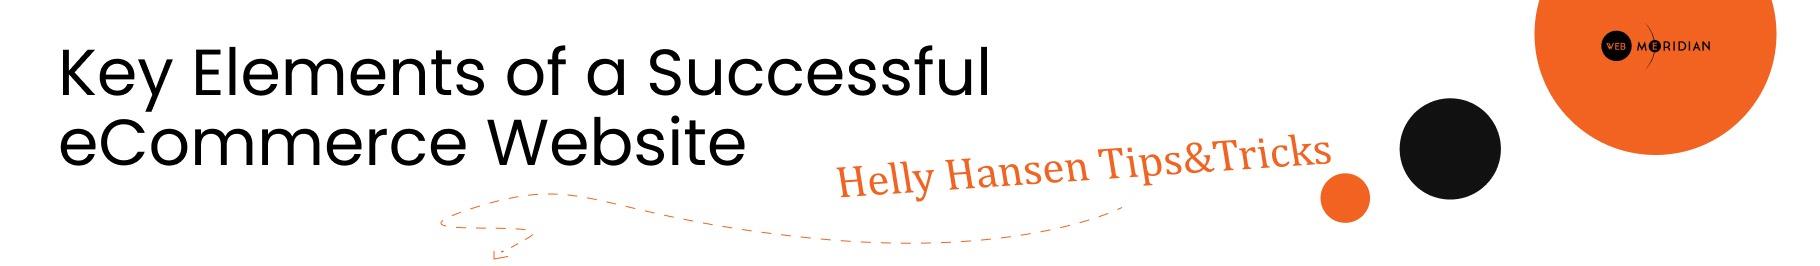 Bonus Material: Key Elements of a Successful eCommerce Website   Helly Hansen Tips&Tricks